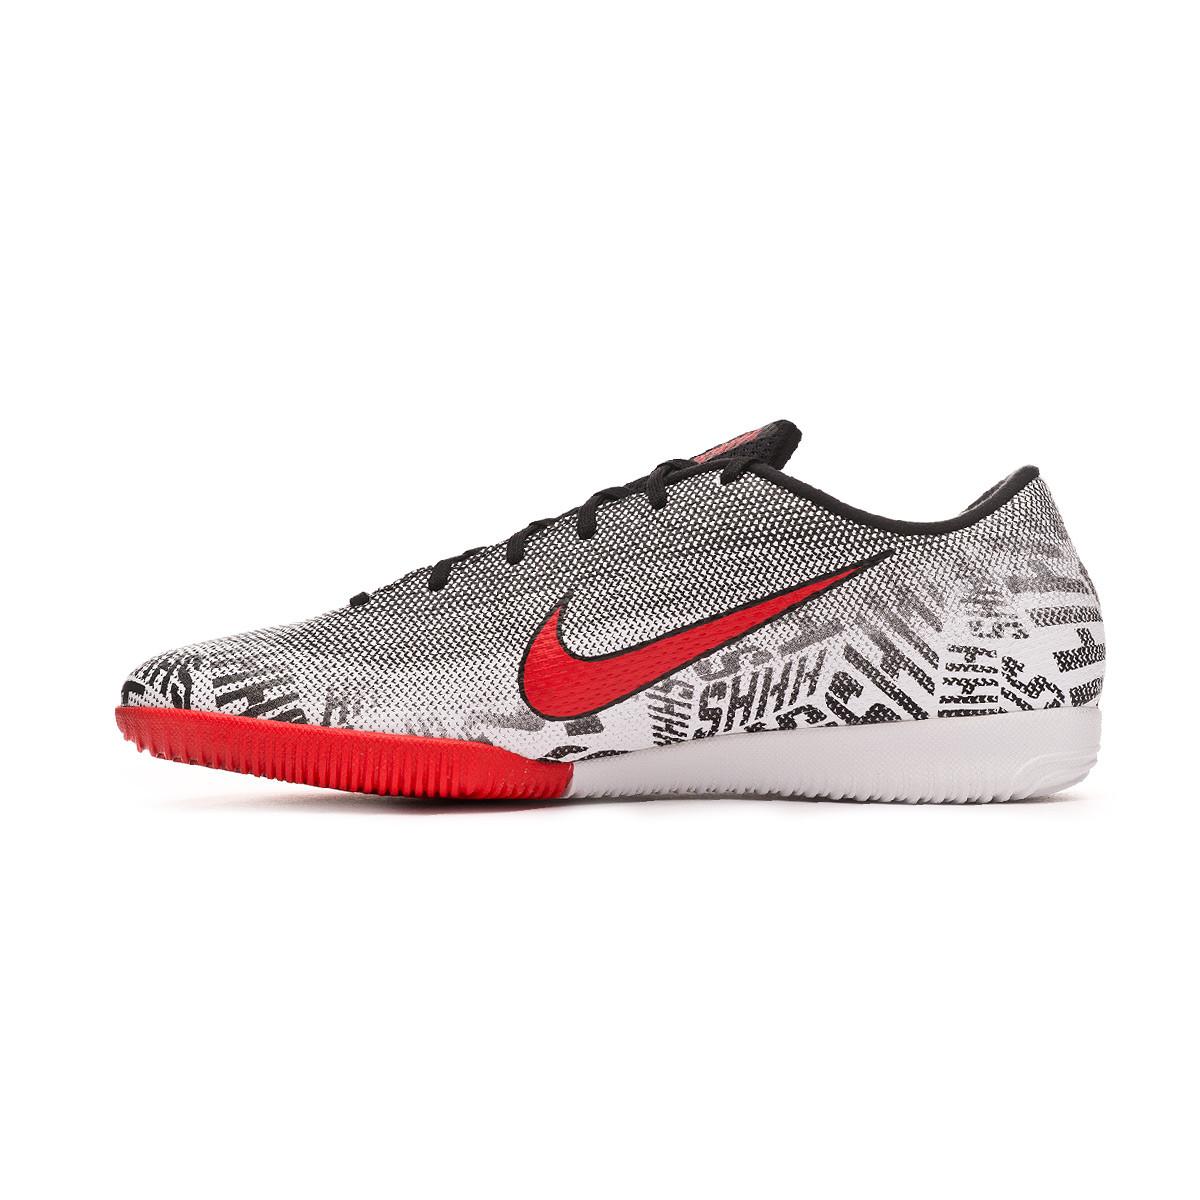 pretty nice 372b7 177cf Tenis Nike Mercurial VaporX XII Academy Neymar Jr IC White-Challenge  red-Black - Tienda de fútbol Fútbol Emotion